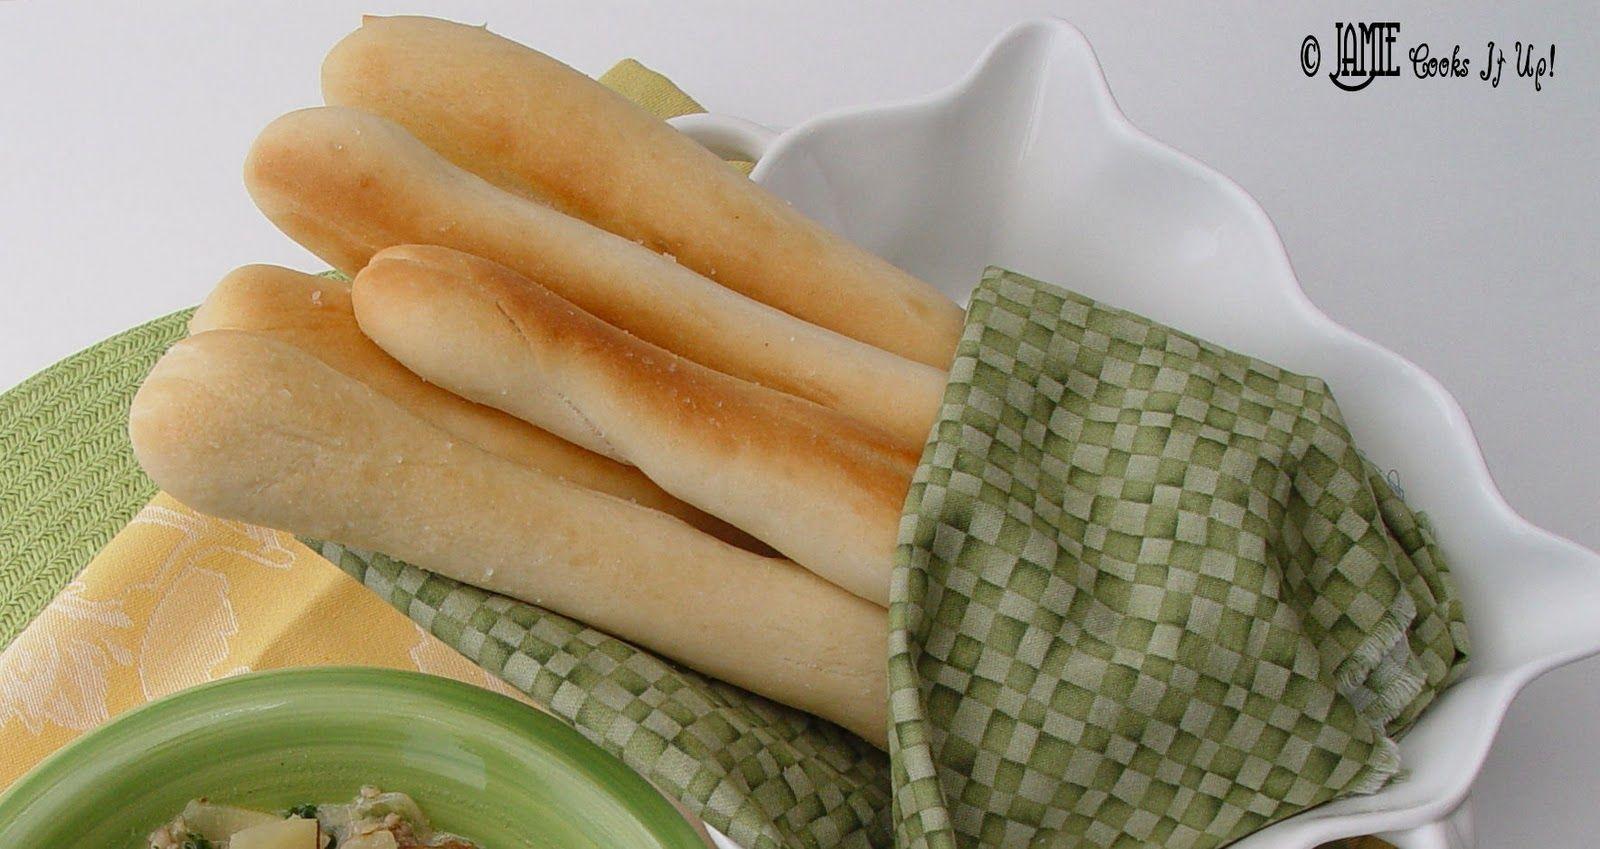 Pin By Rose Lafferty On F O O D Breadsticks Yummy Homemade Bread Olive Garden Breadsticks